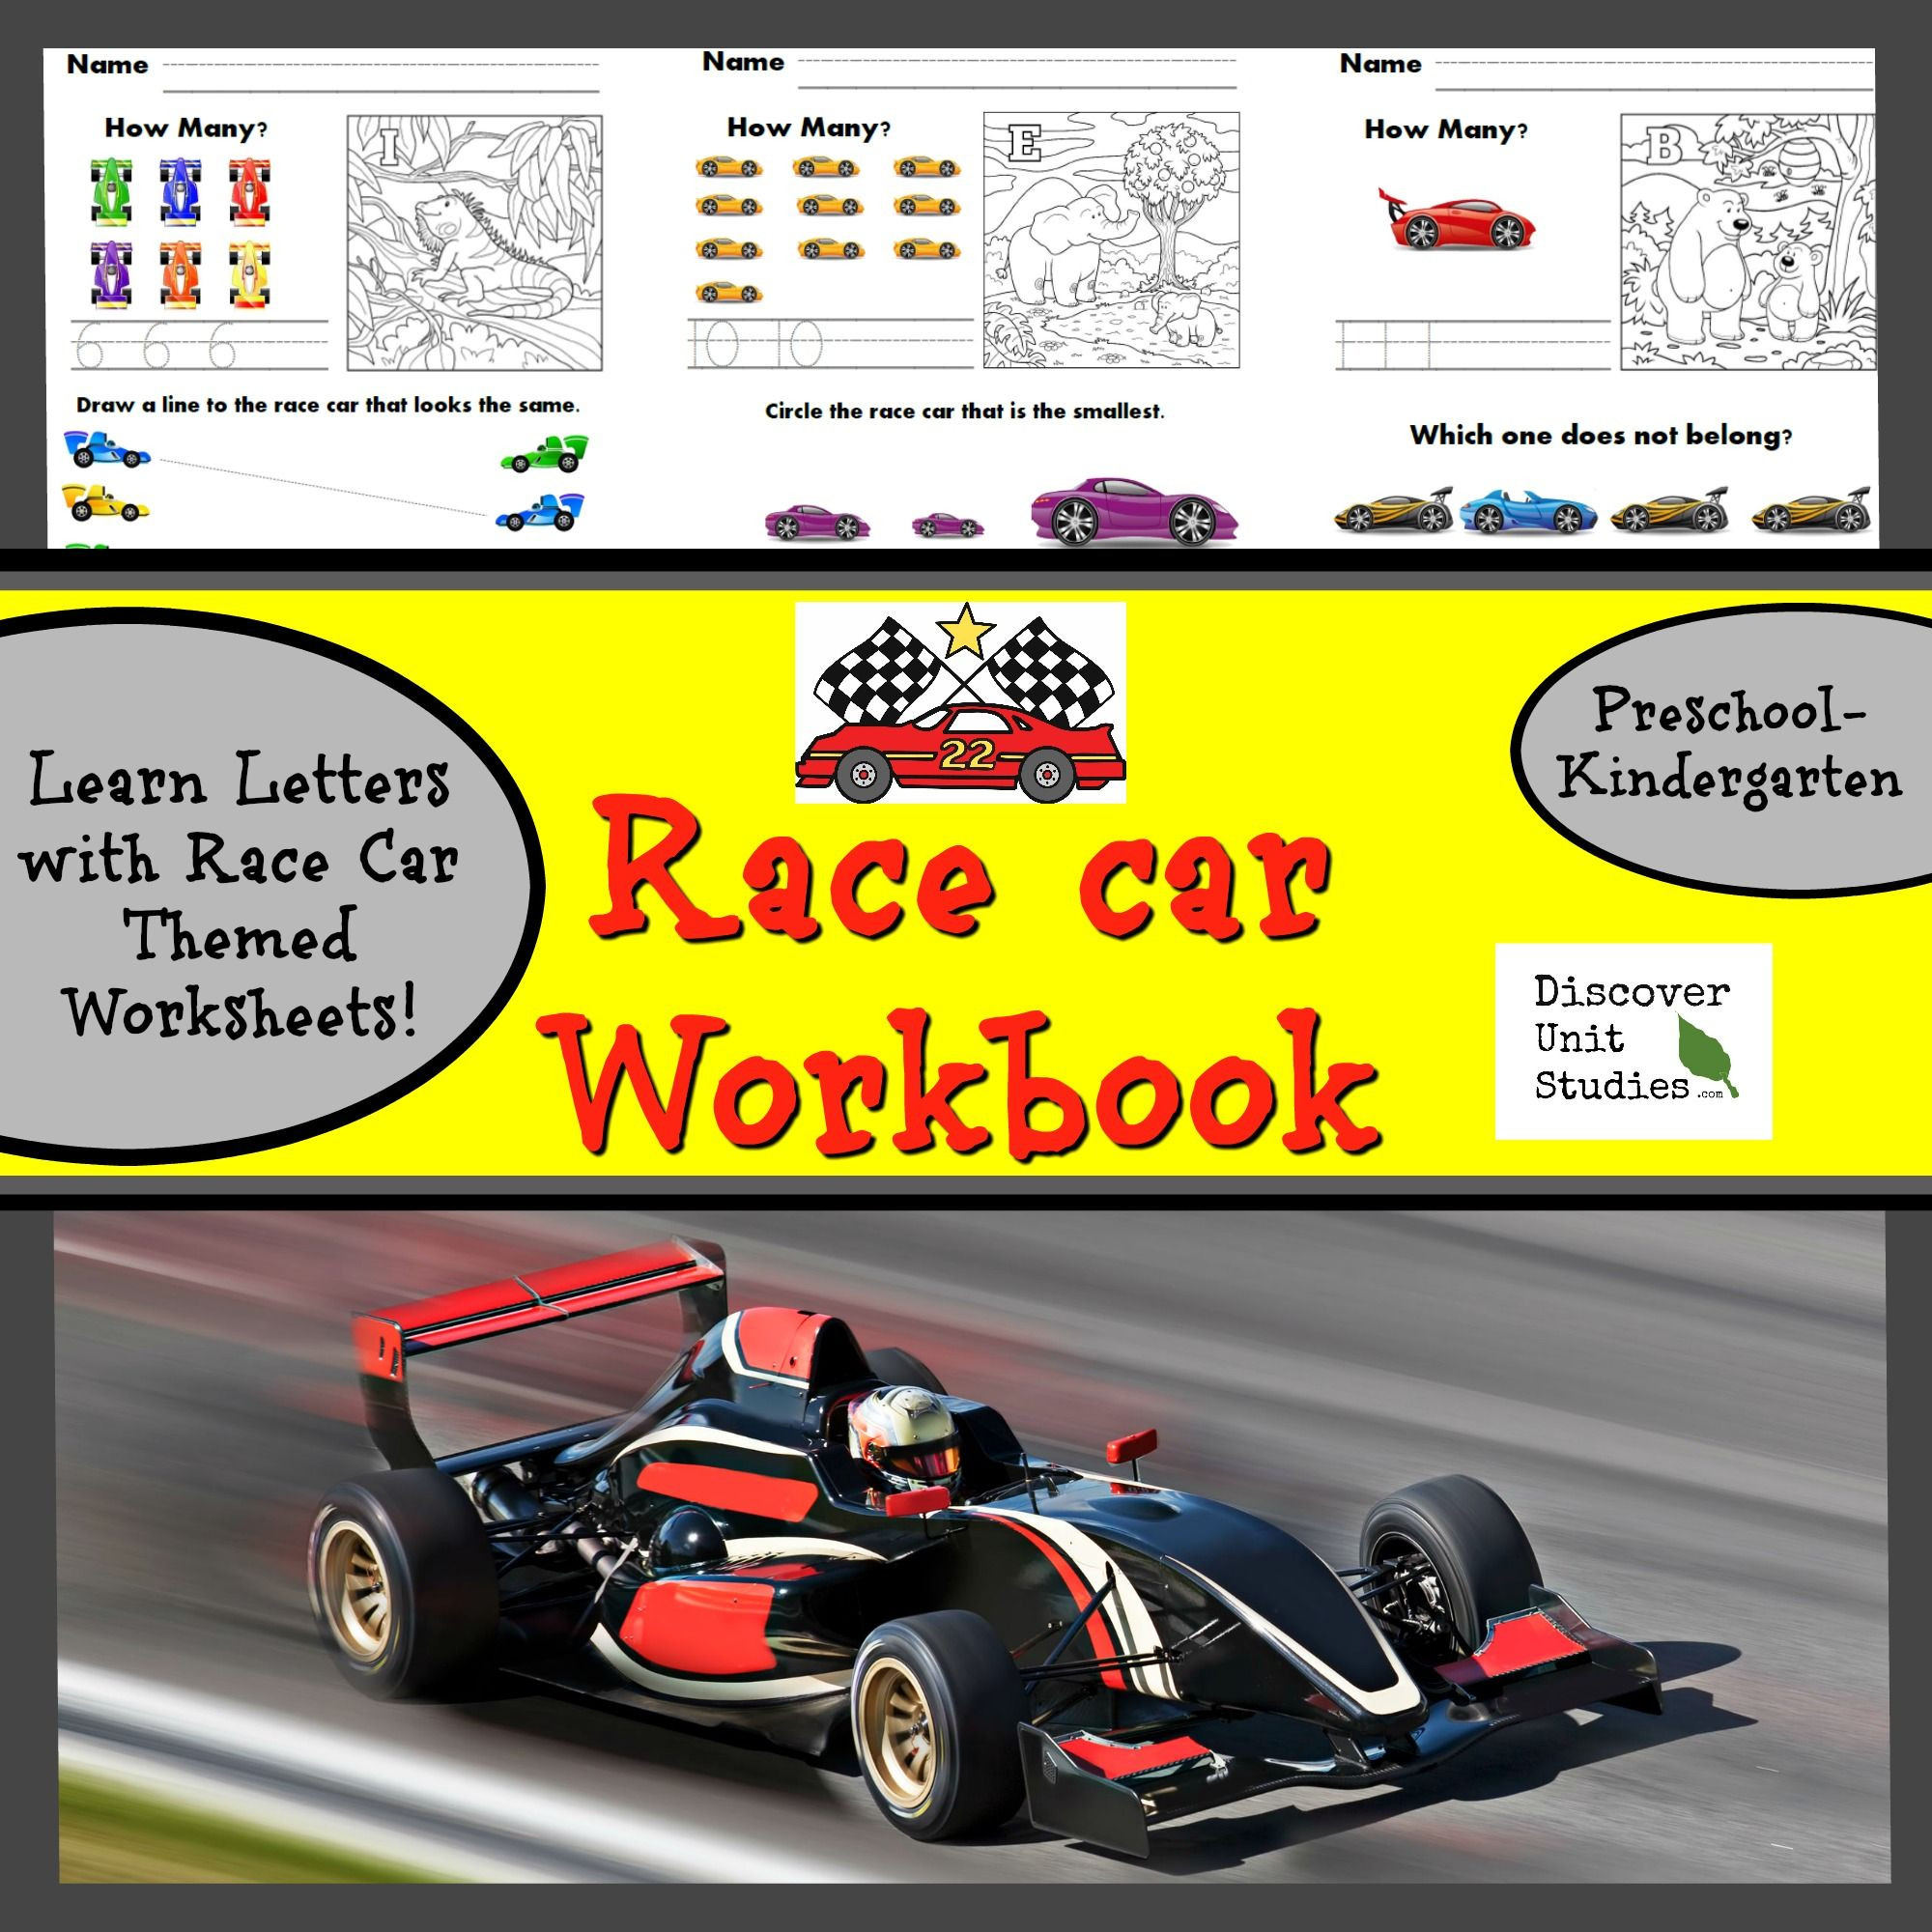 Race Car Student Workbook Download